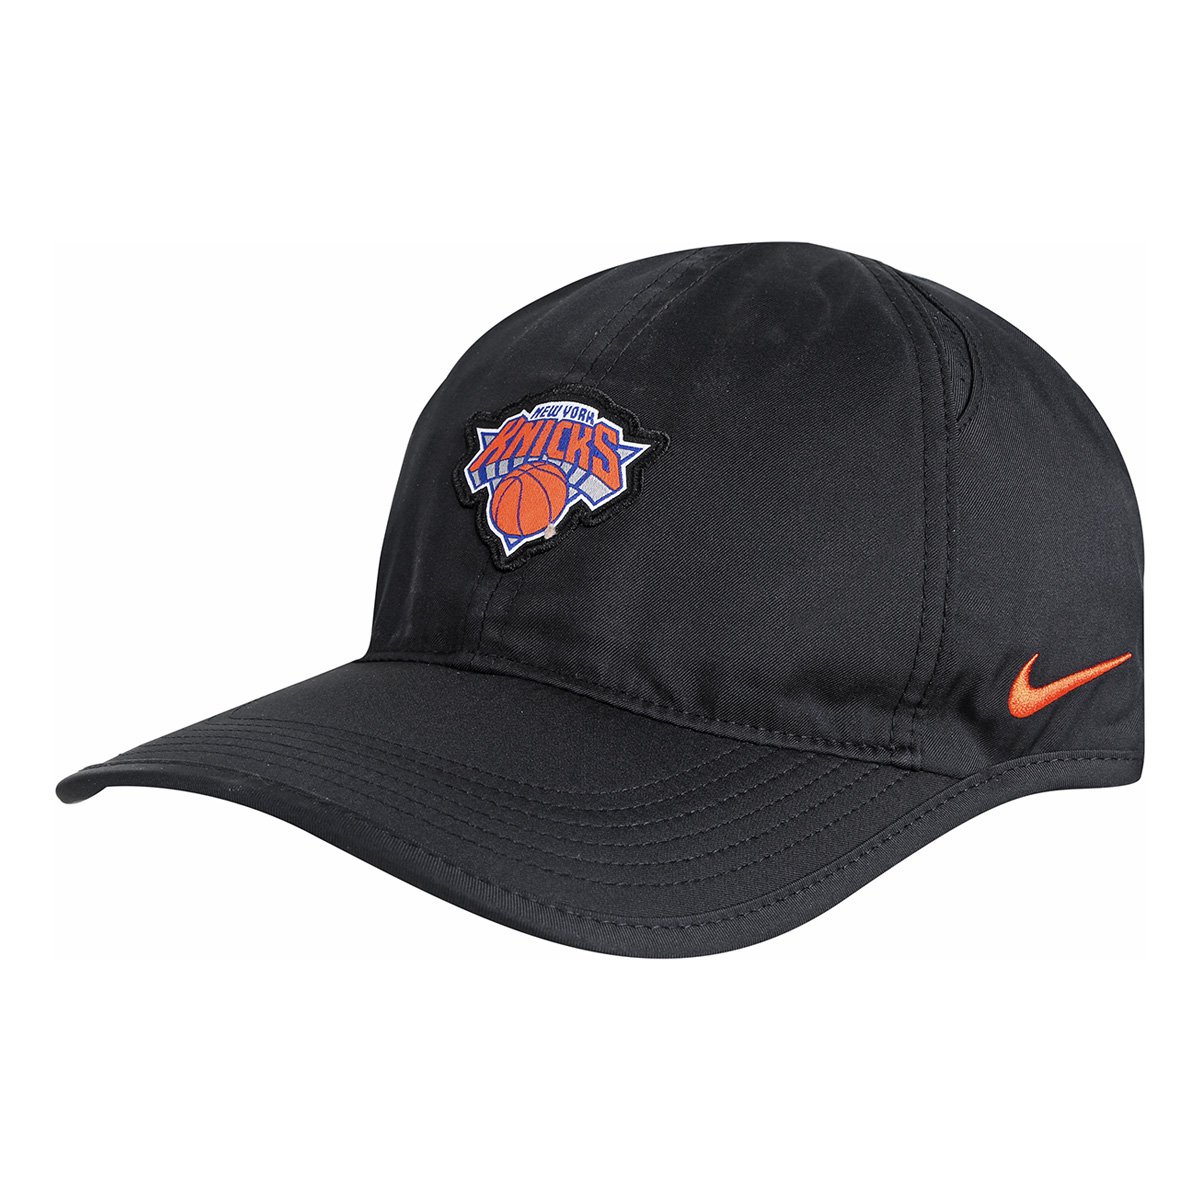 Boné NBA New York Knicks Nike Aba Curva Featherlight - Preto e Laranja -  Compre Agora  da0dfe805ff96